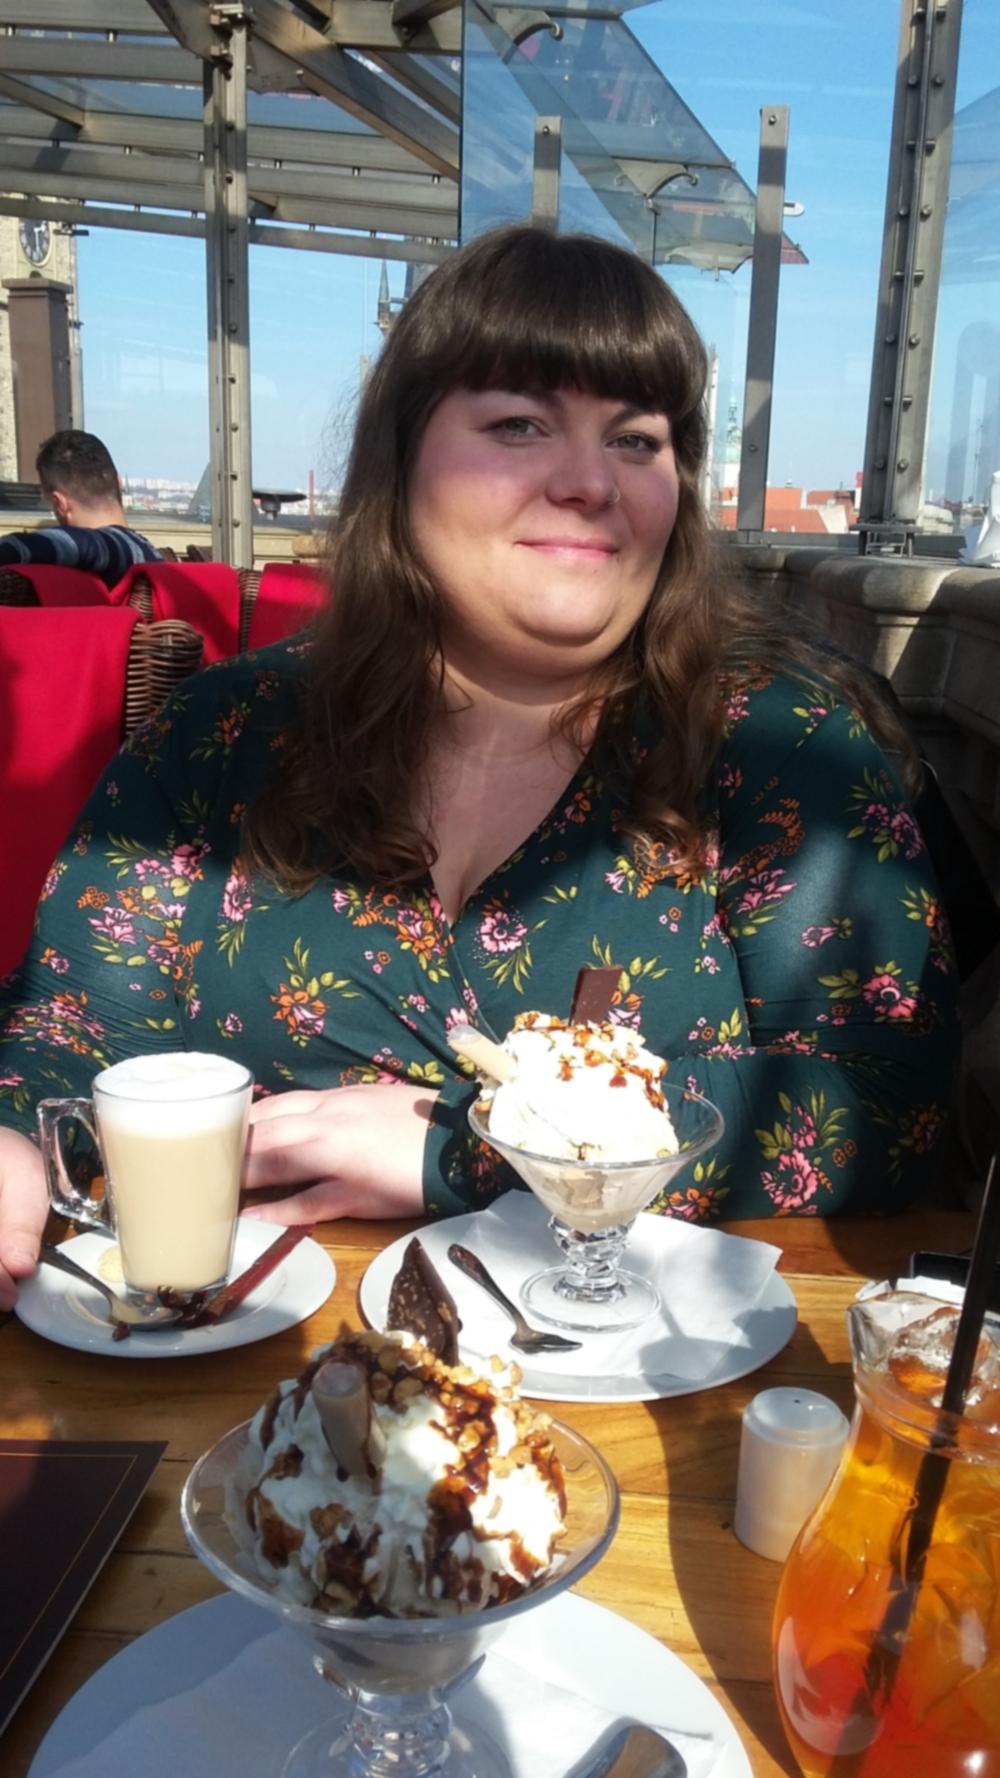 Katrinski im Restaurant über den Dächern Prags am Altstädter Ring